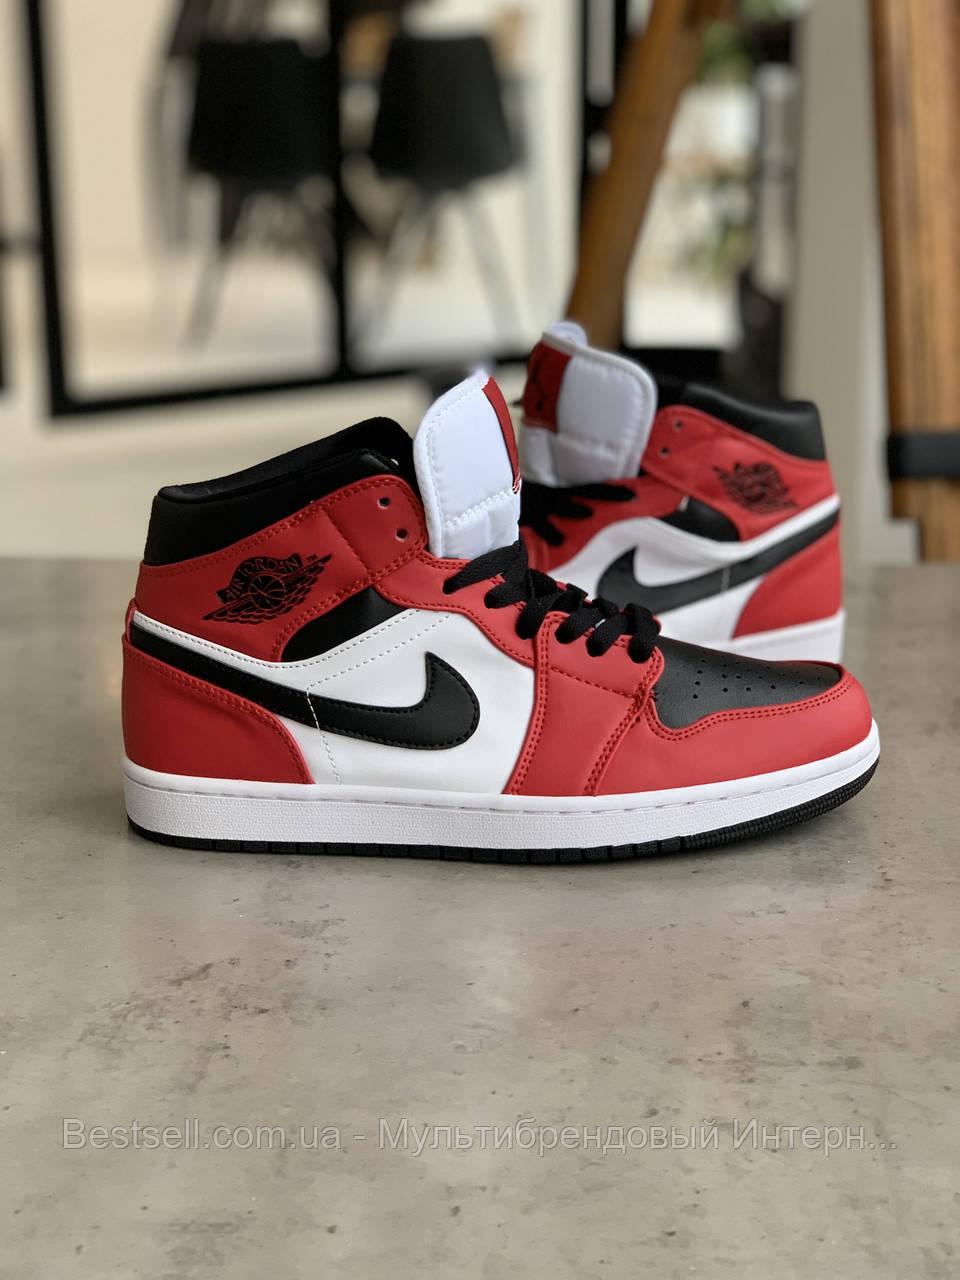 Кроссовки Nike Air Jordan 1 Retro Black&Red Найк Аир Джордан 1 Ретро Красно-чёрные (42,43,44,45)